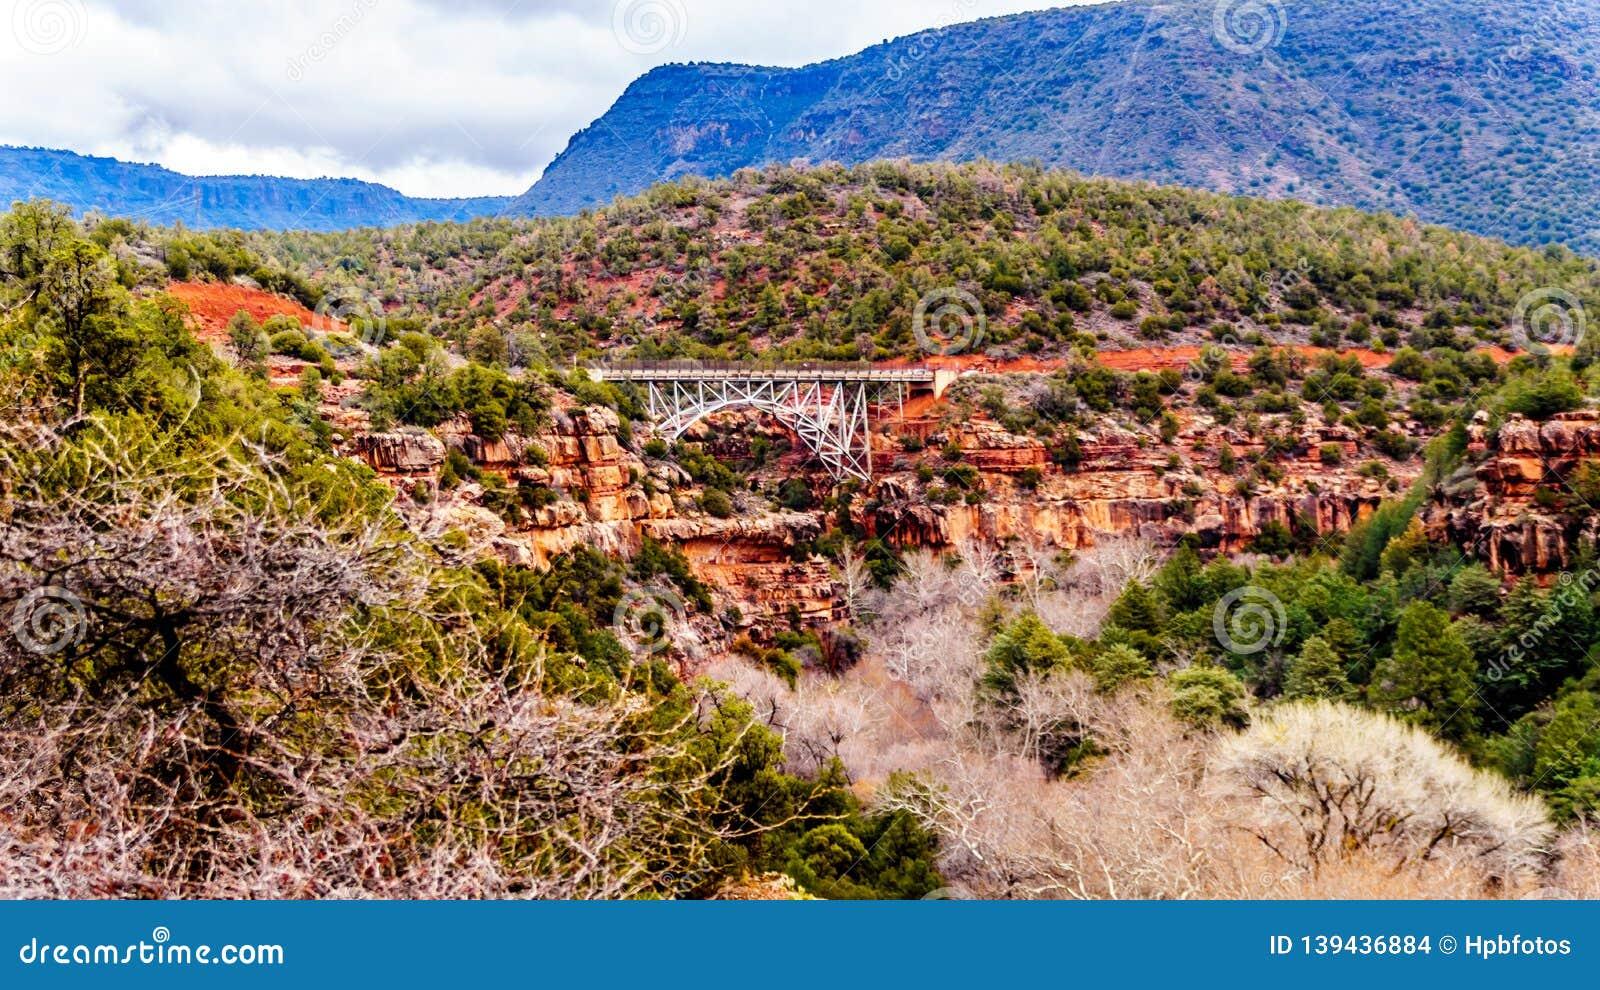 The steel structure of Midgely Bridge on Arizona SR89A between Sedona and Flagstaff over Wilson Canyon at Oak Creek Canyon